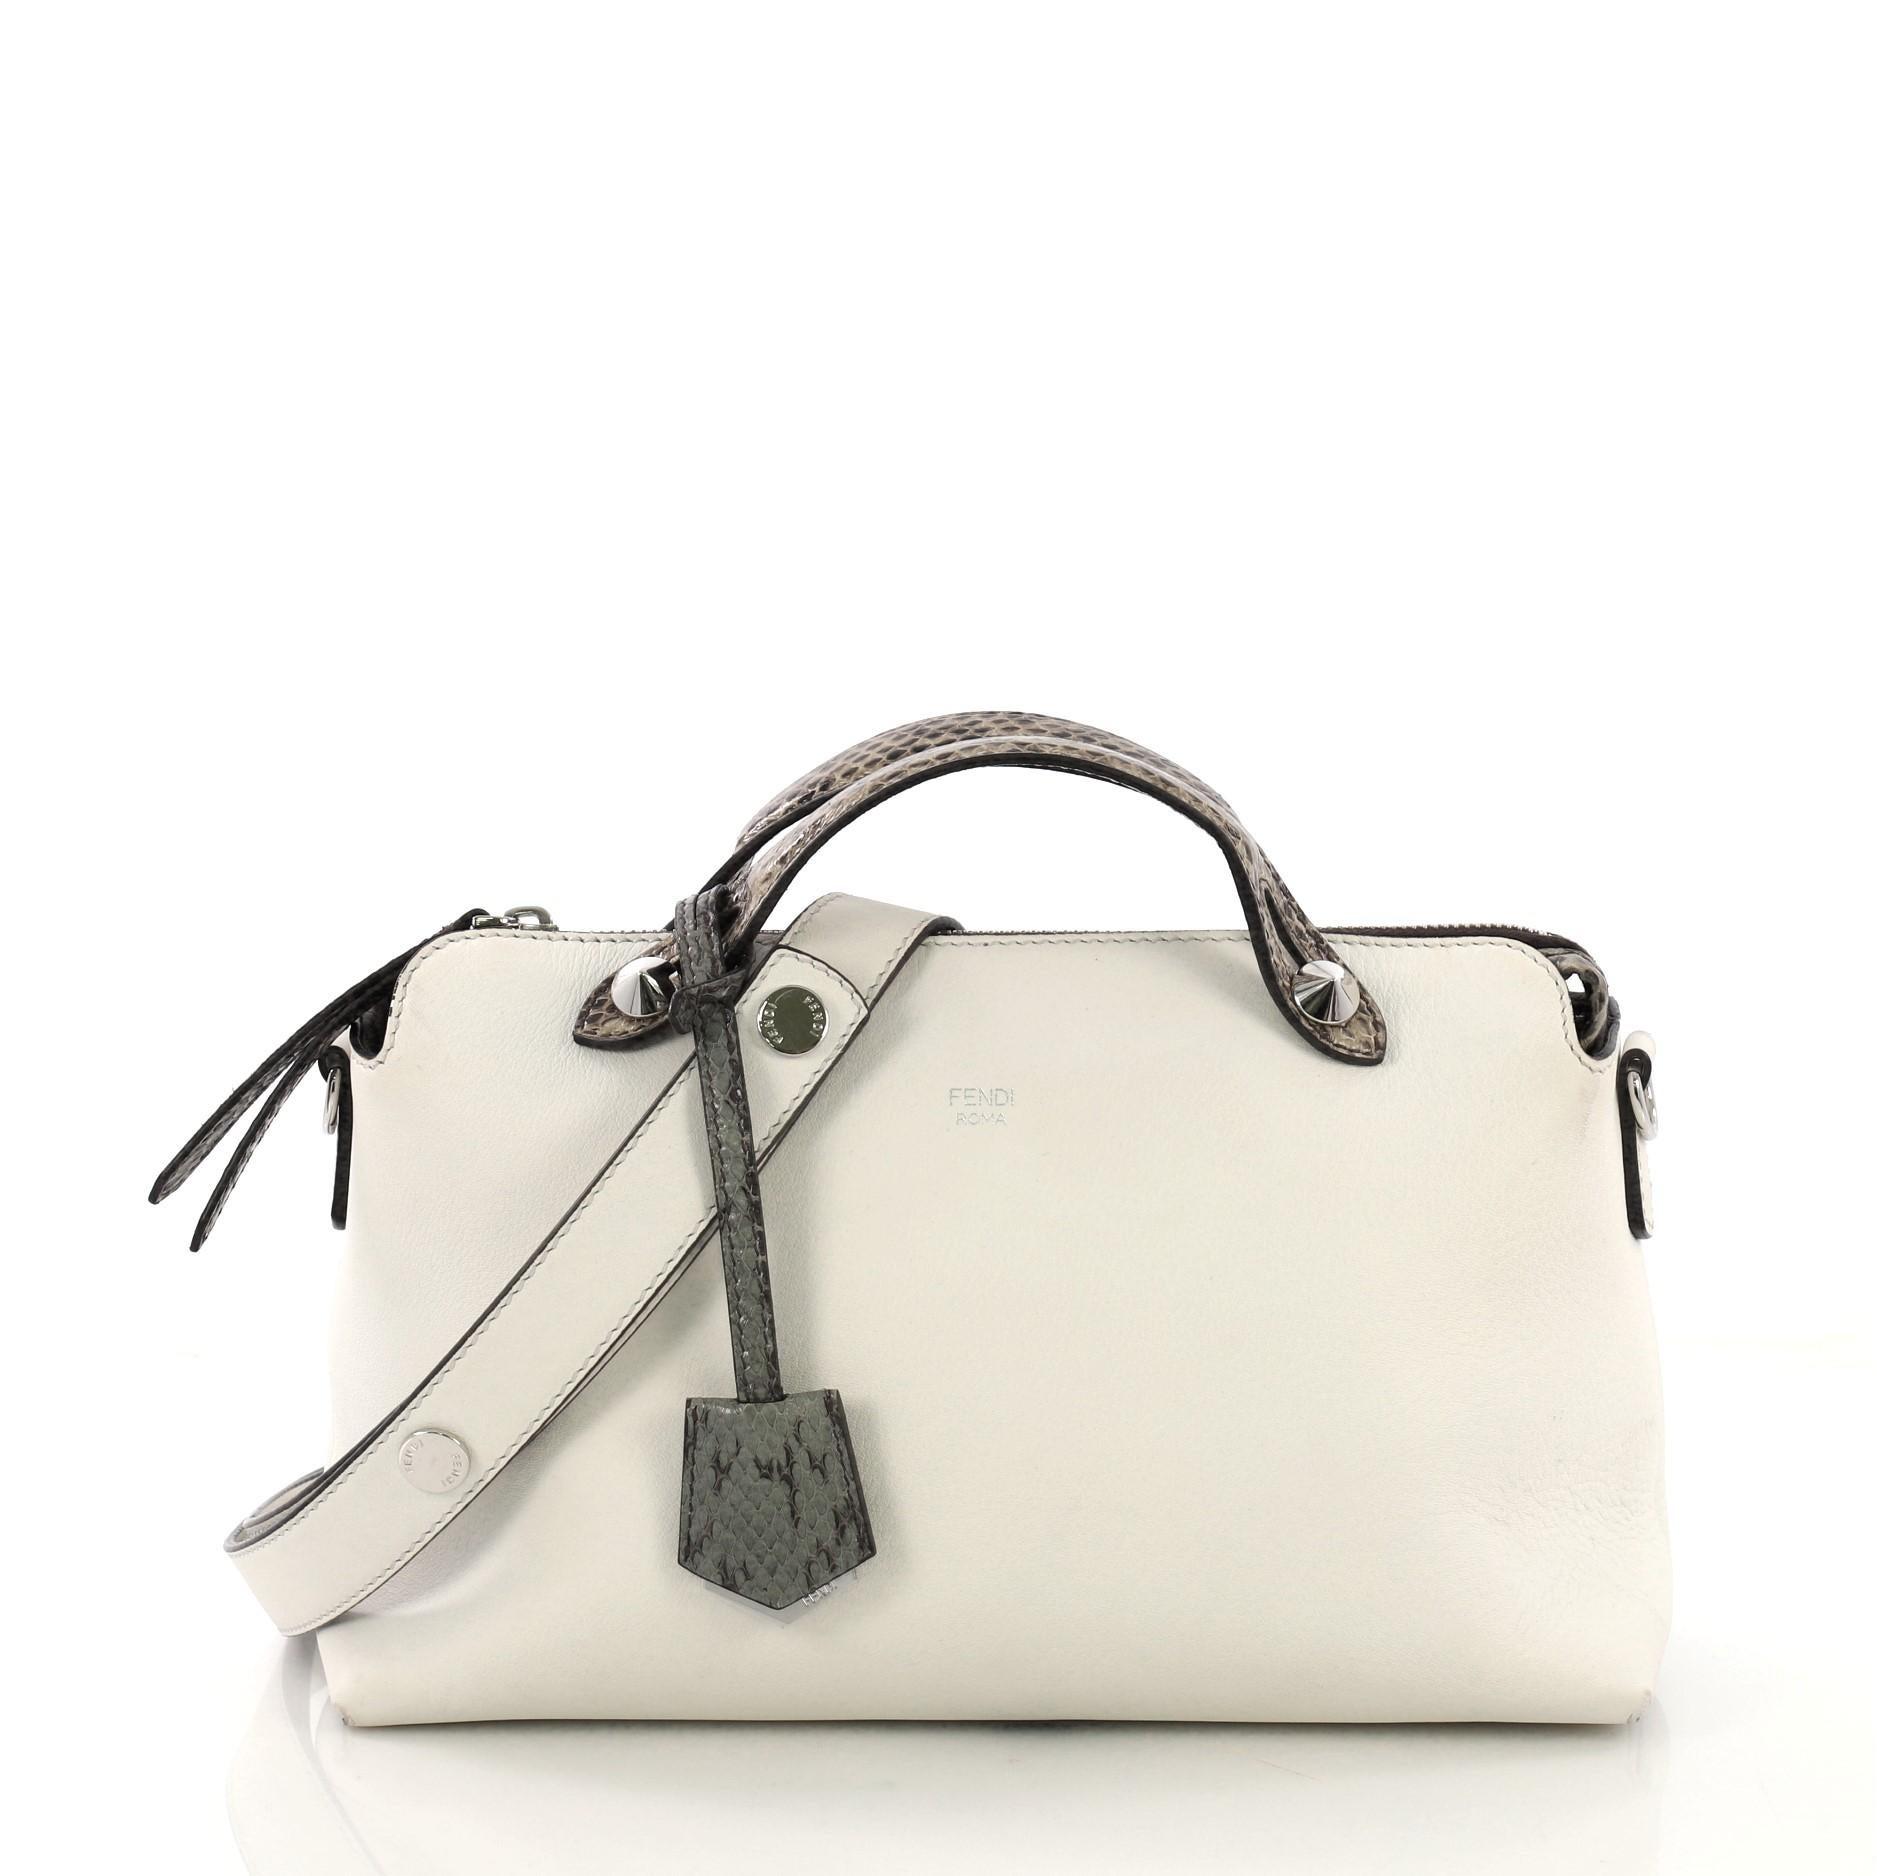 d2a0a1c4f16e1 Rebag Tote Bags - 1stdibs